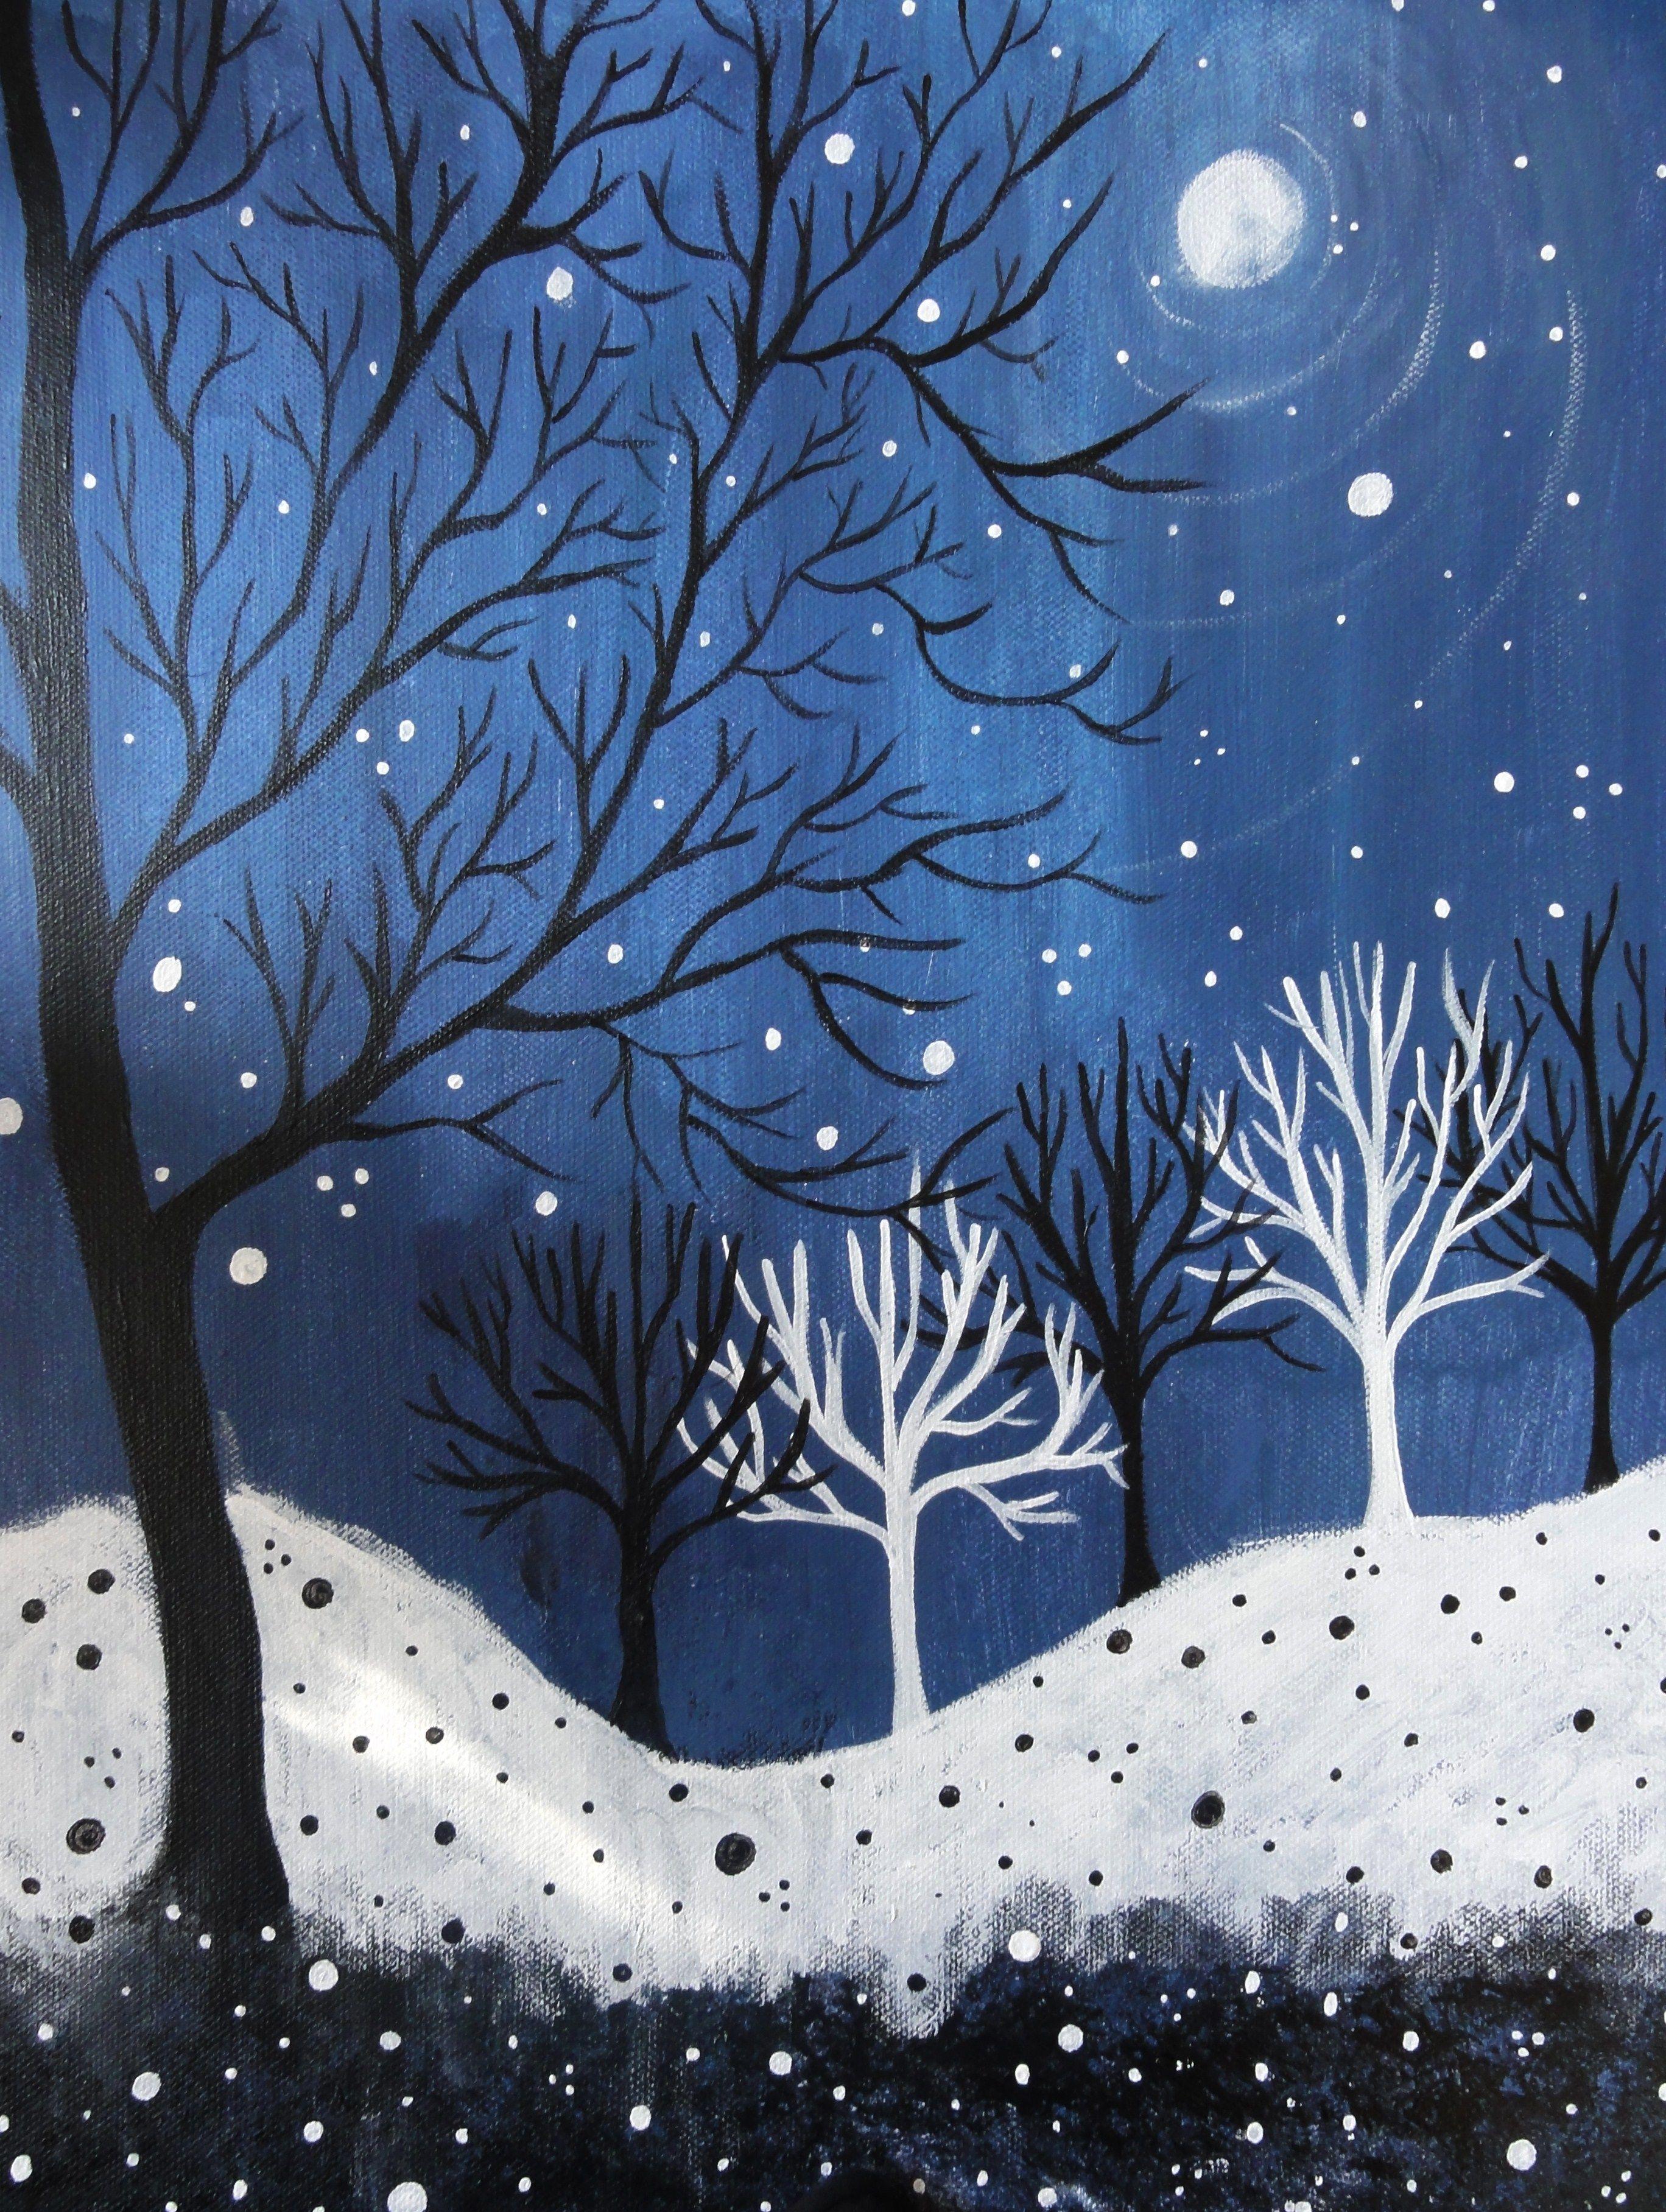 pin by margie manifold on winter in art pinterest